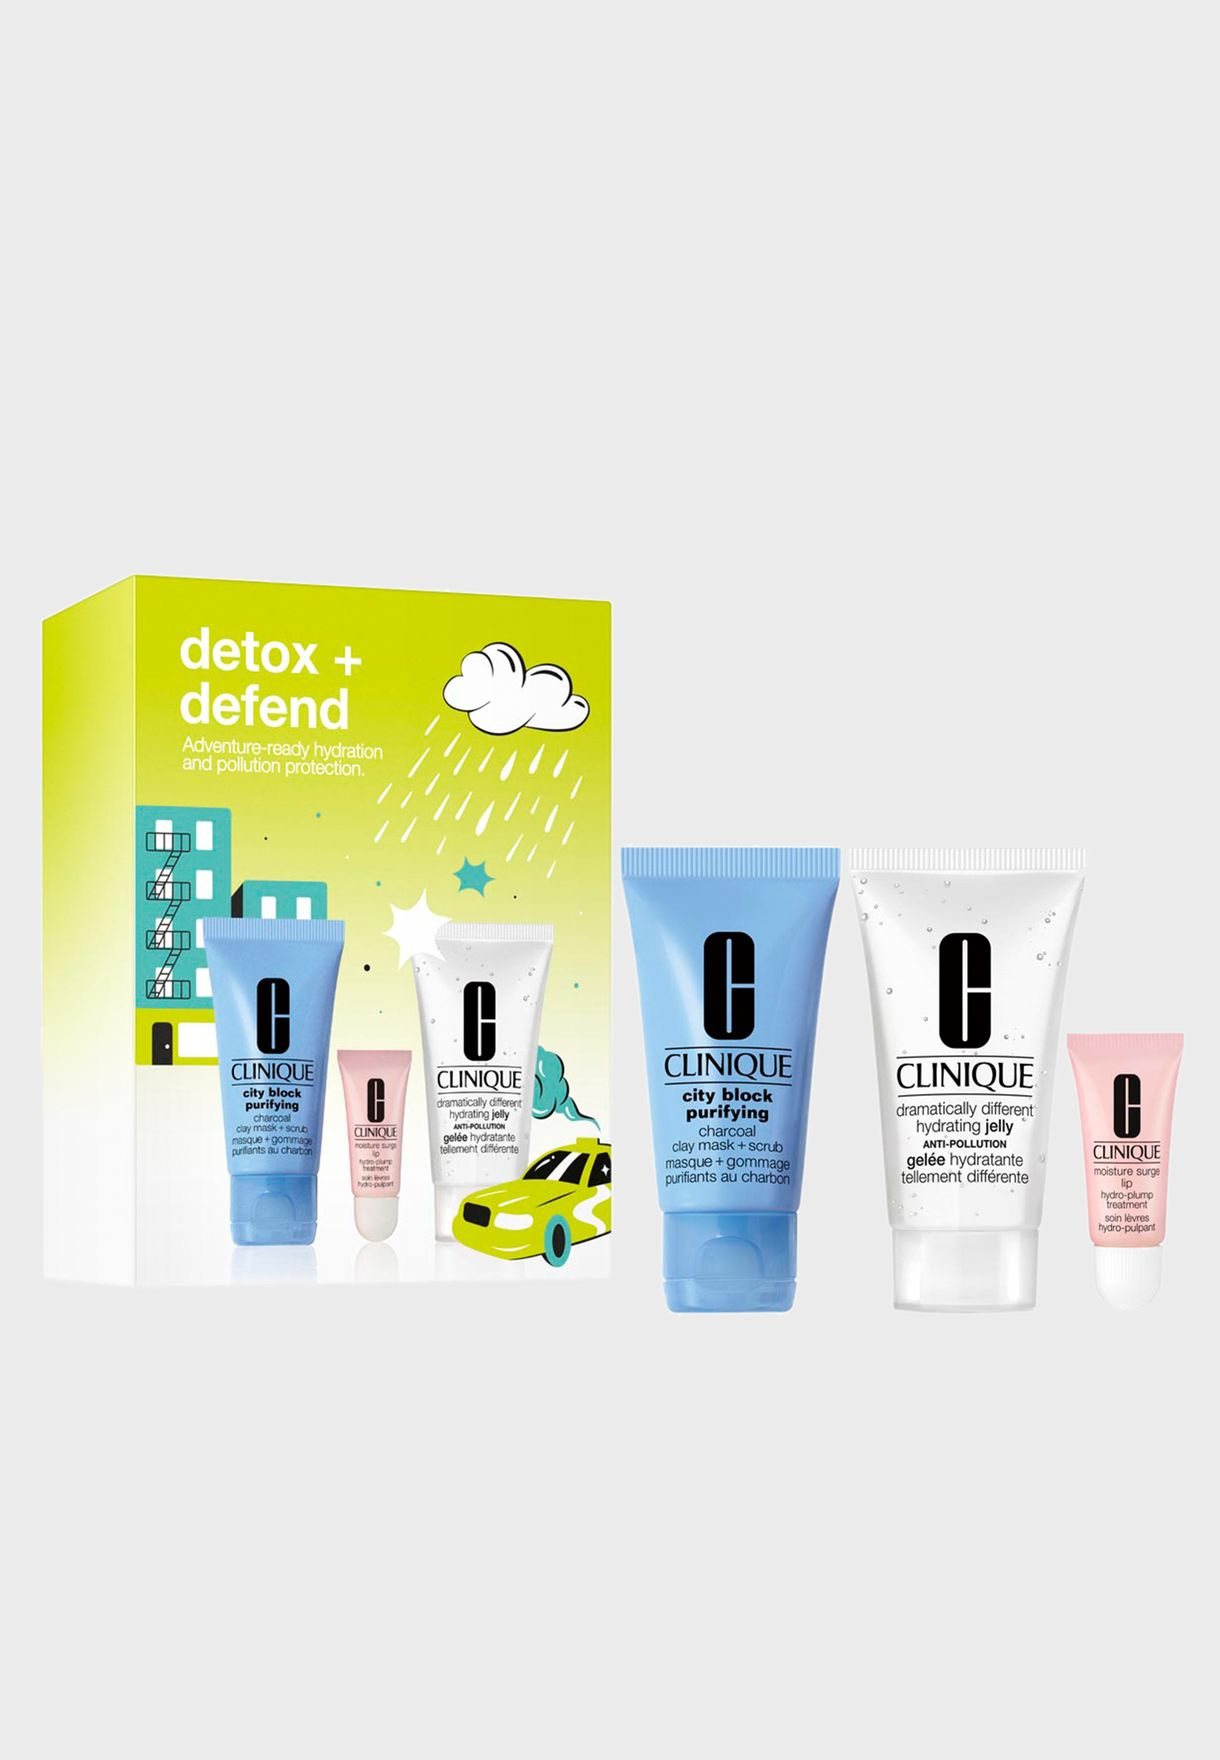 Pollution Proof Skin Detox + Defend Kit,Saving 48%